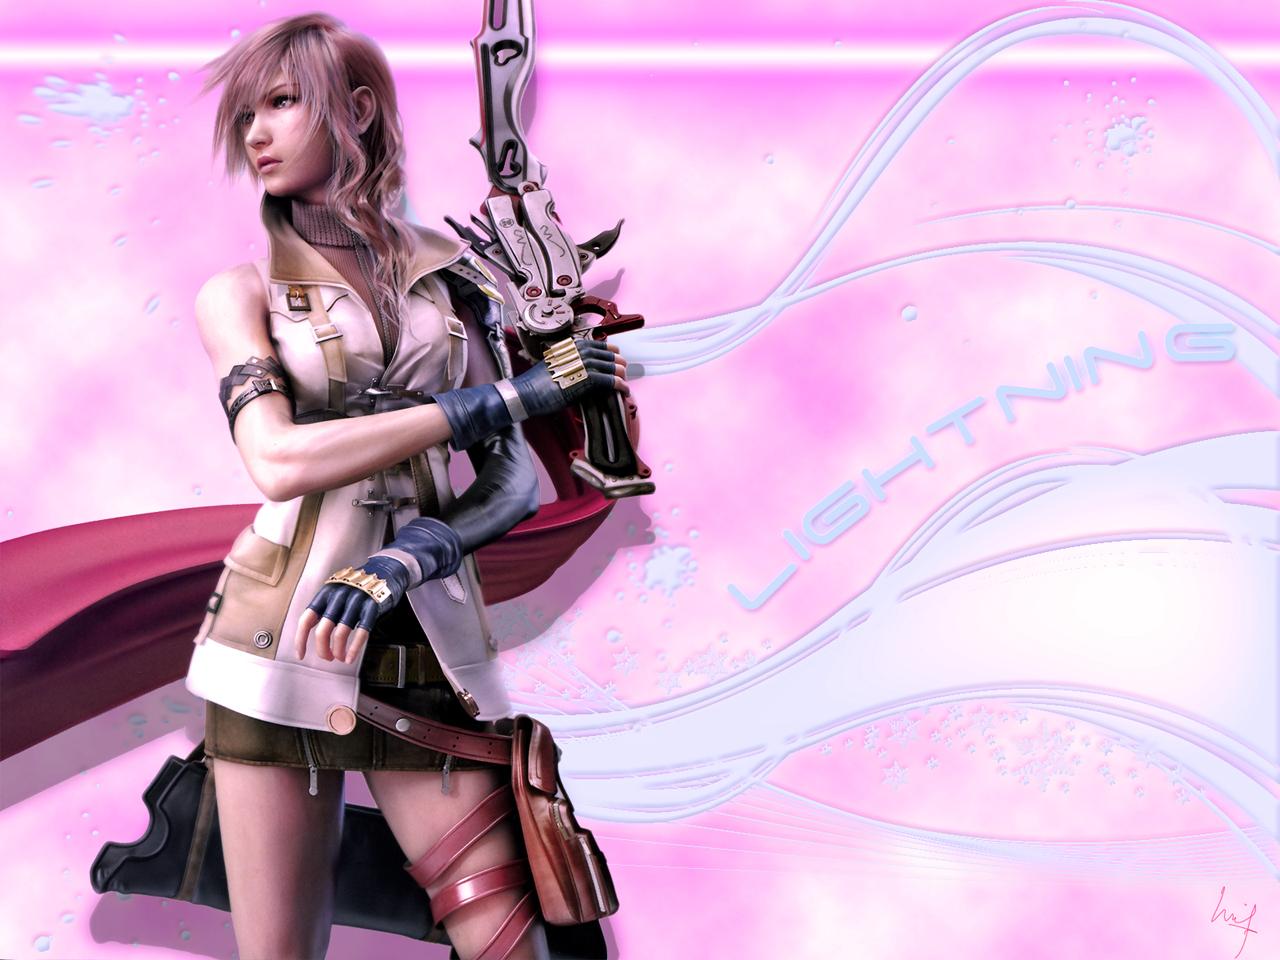 wallpapers que têm vossos desktops Final_Fantasy_XIII_Lightning_2_by_Grimmjow_Akutabi